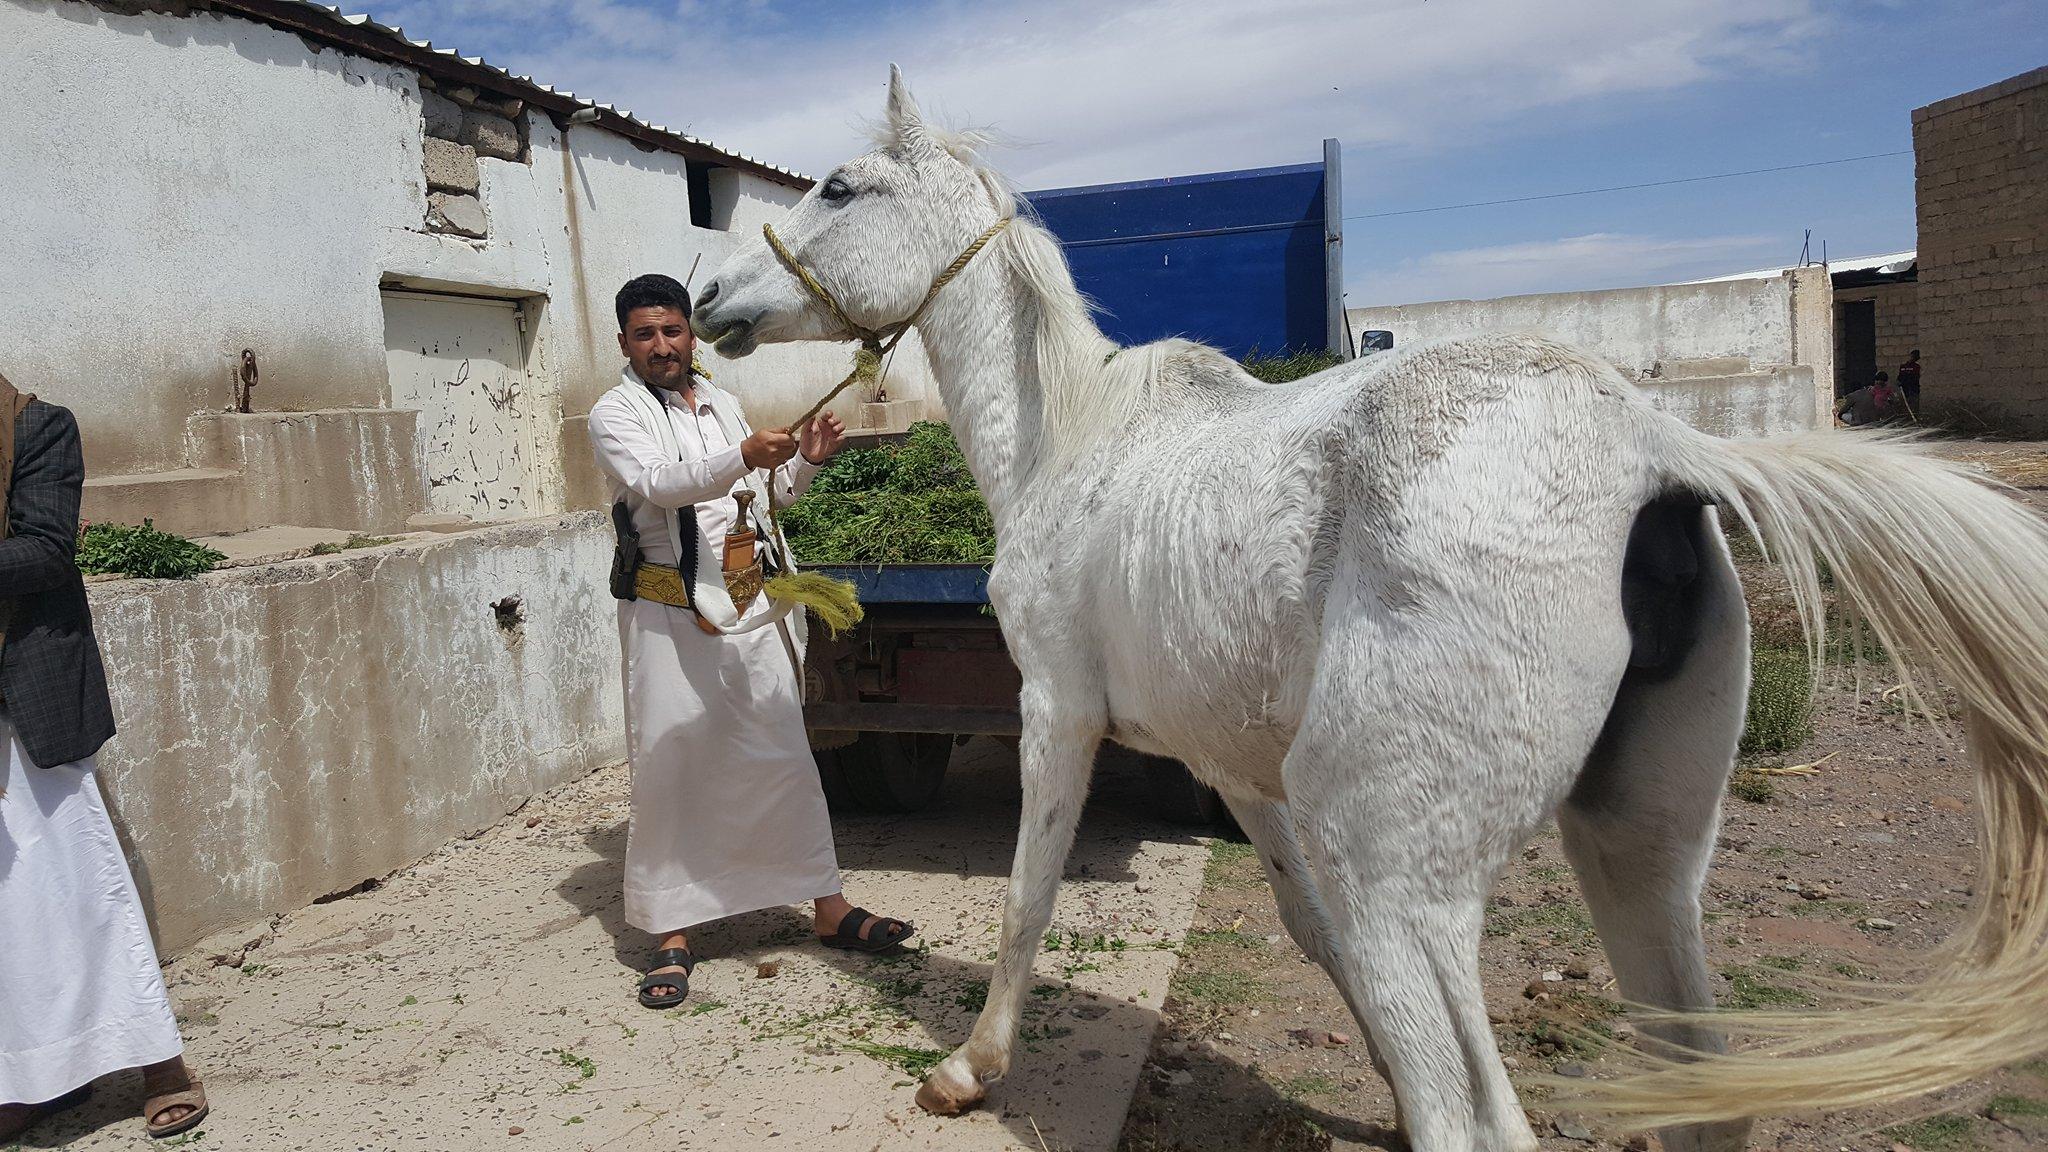 dhamar horse with helall heart breaking OWAP-AR providing fodder today 16 nov 2018.jpg